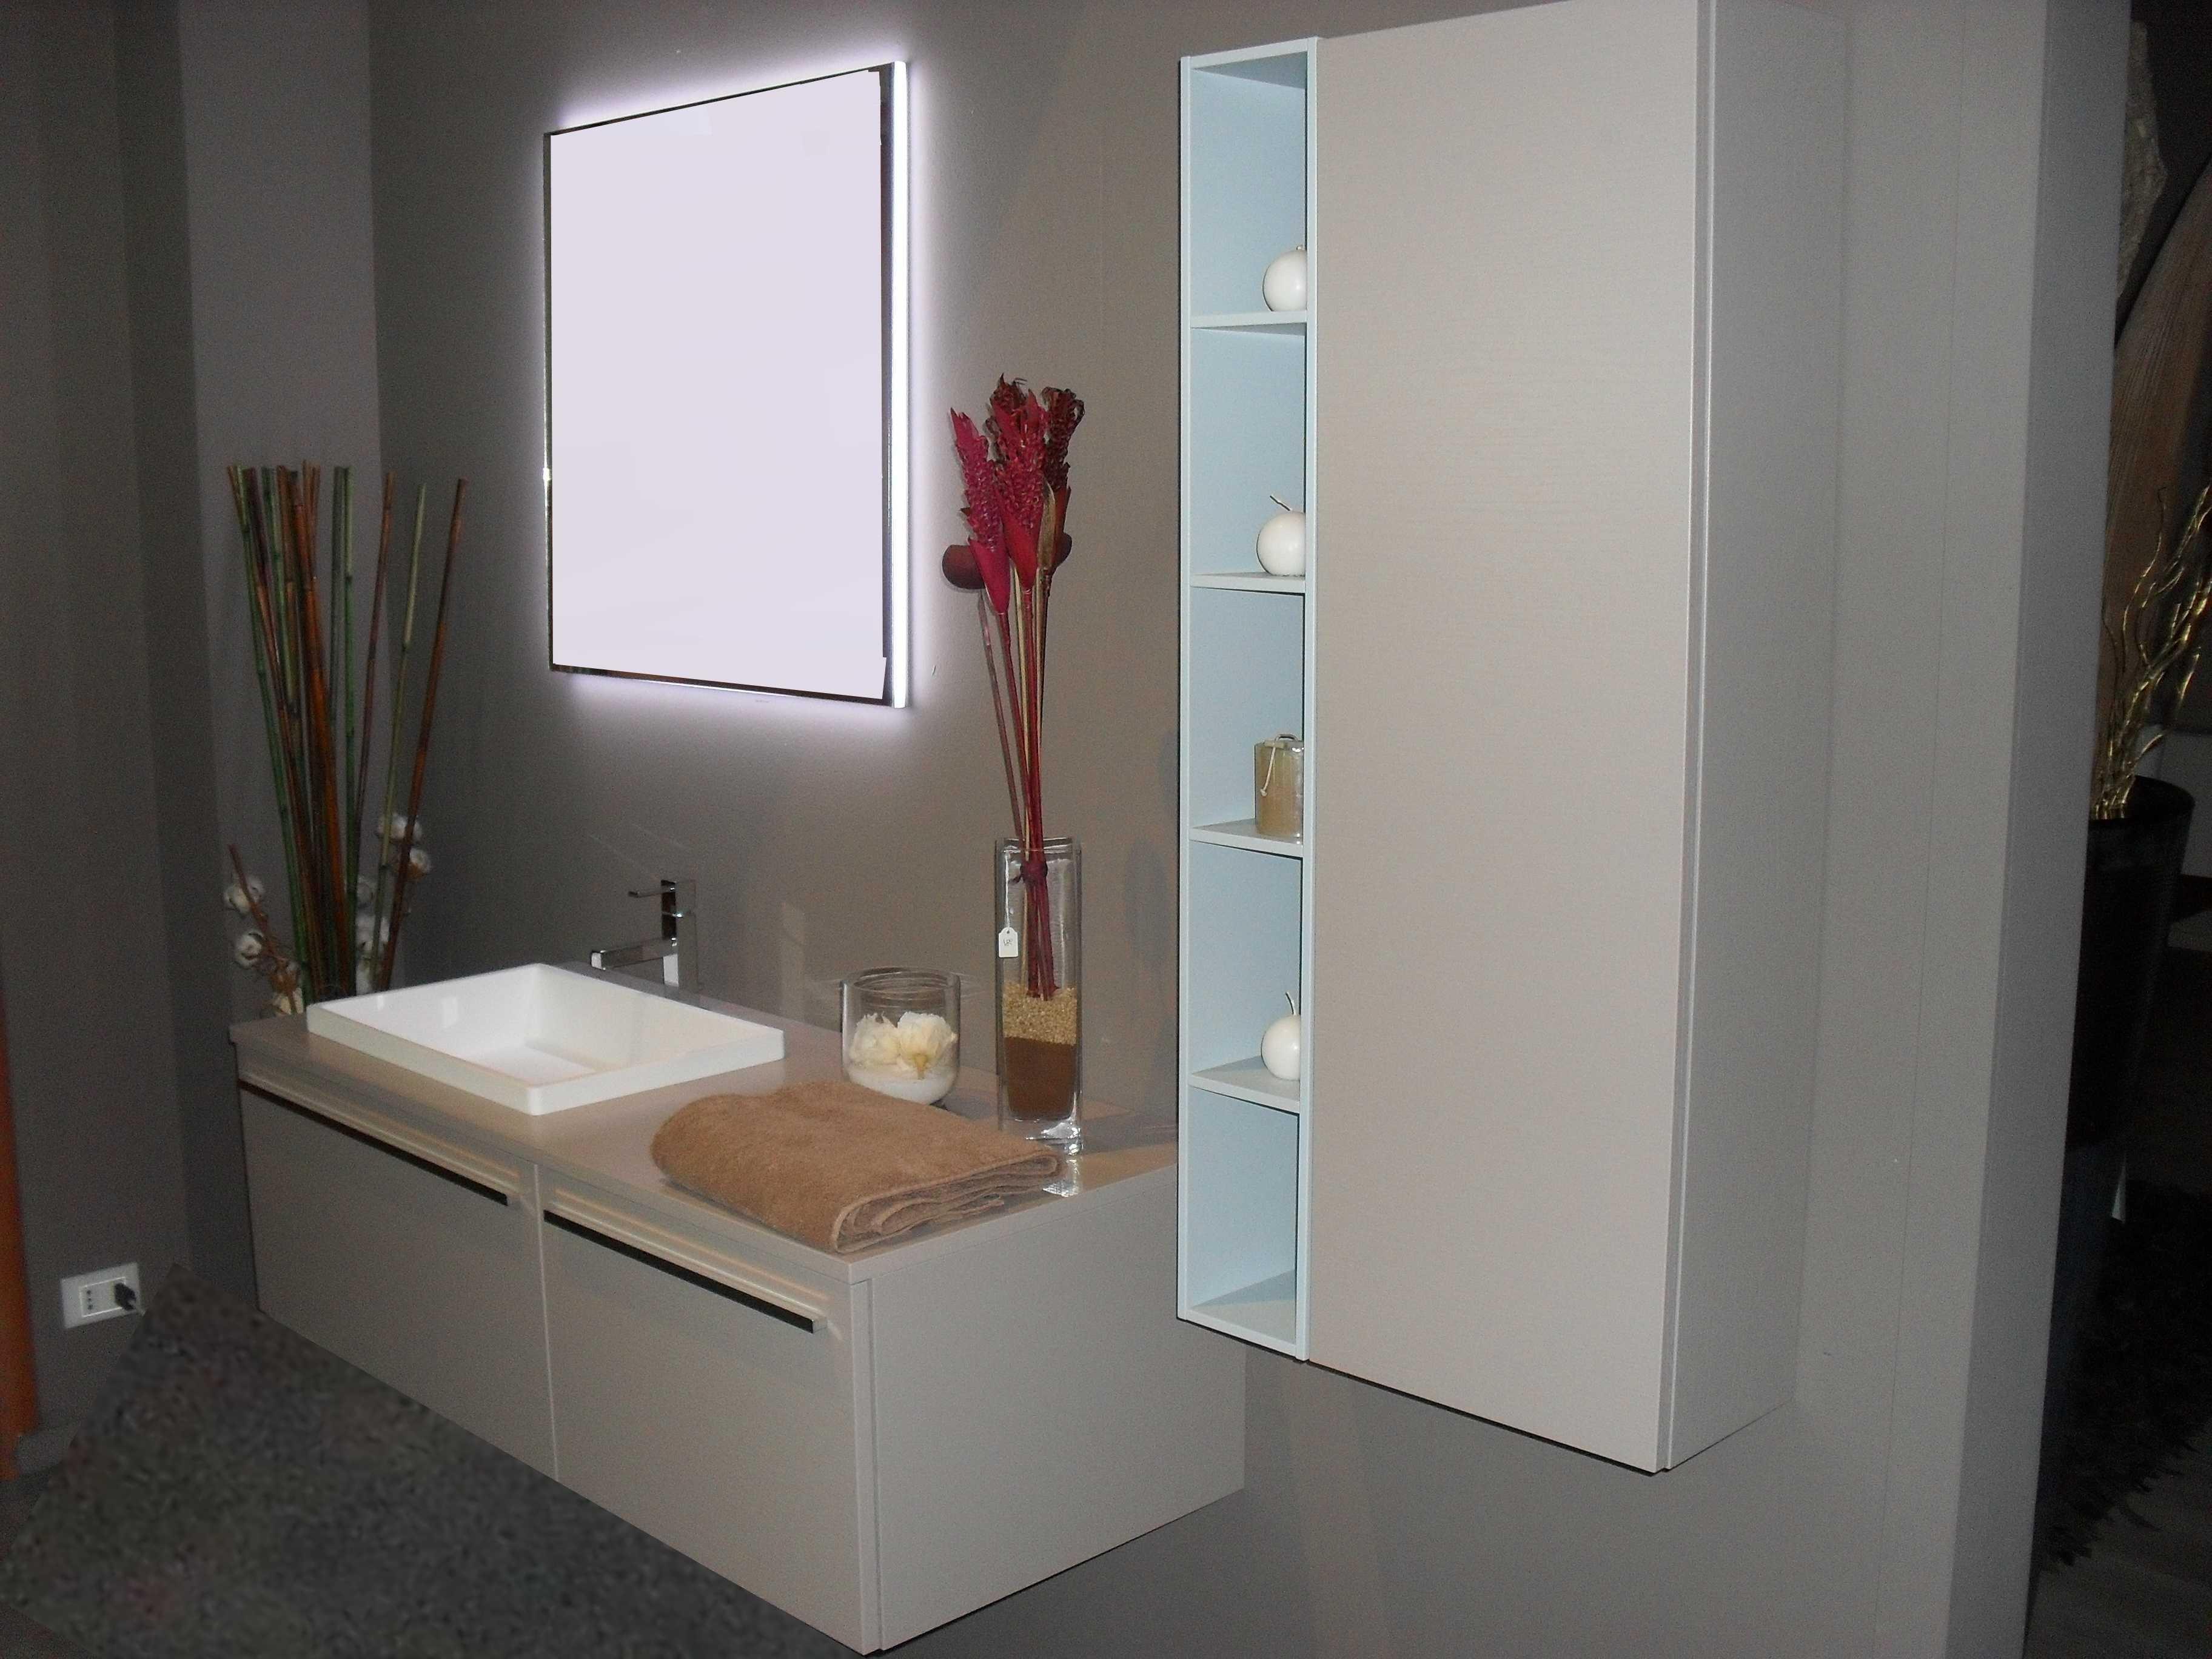 Bagni moderni completi prezzi affordable bagni moderni for Bagni arredo prezzi